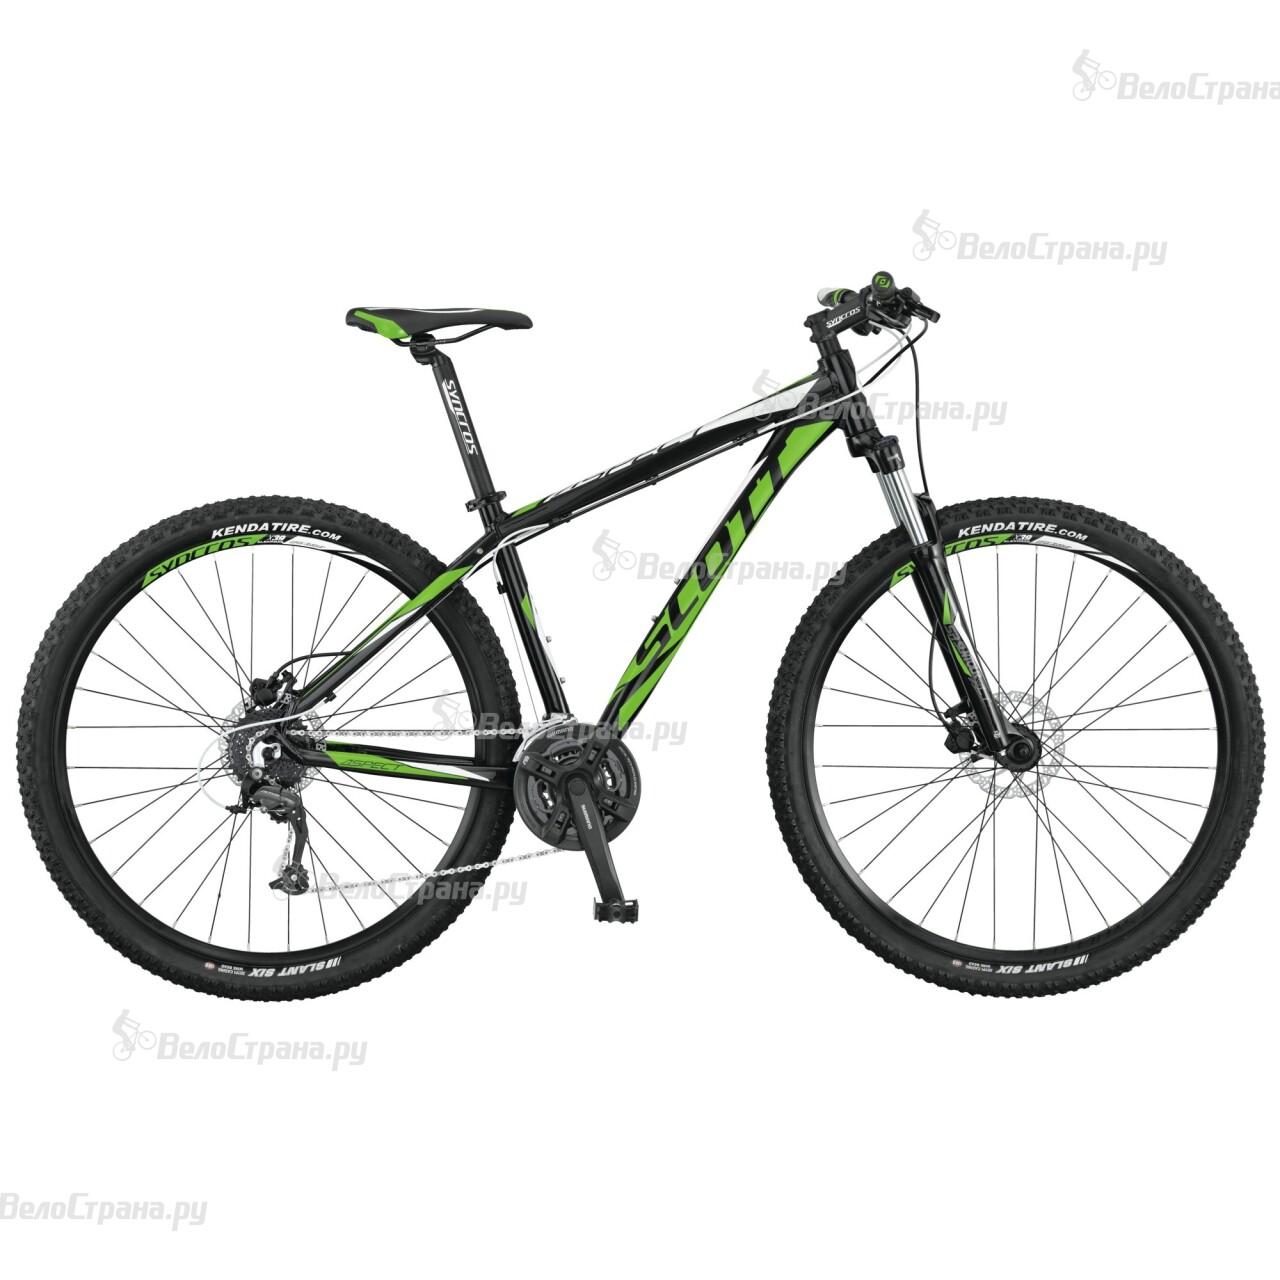 Велосипед Scott Aspect 950 (2015)